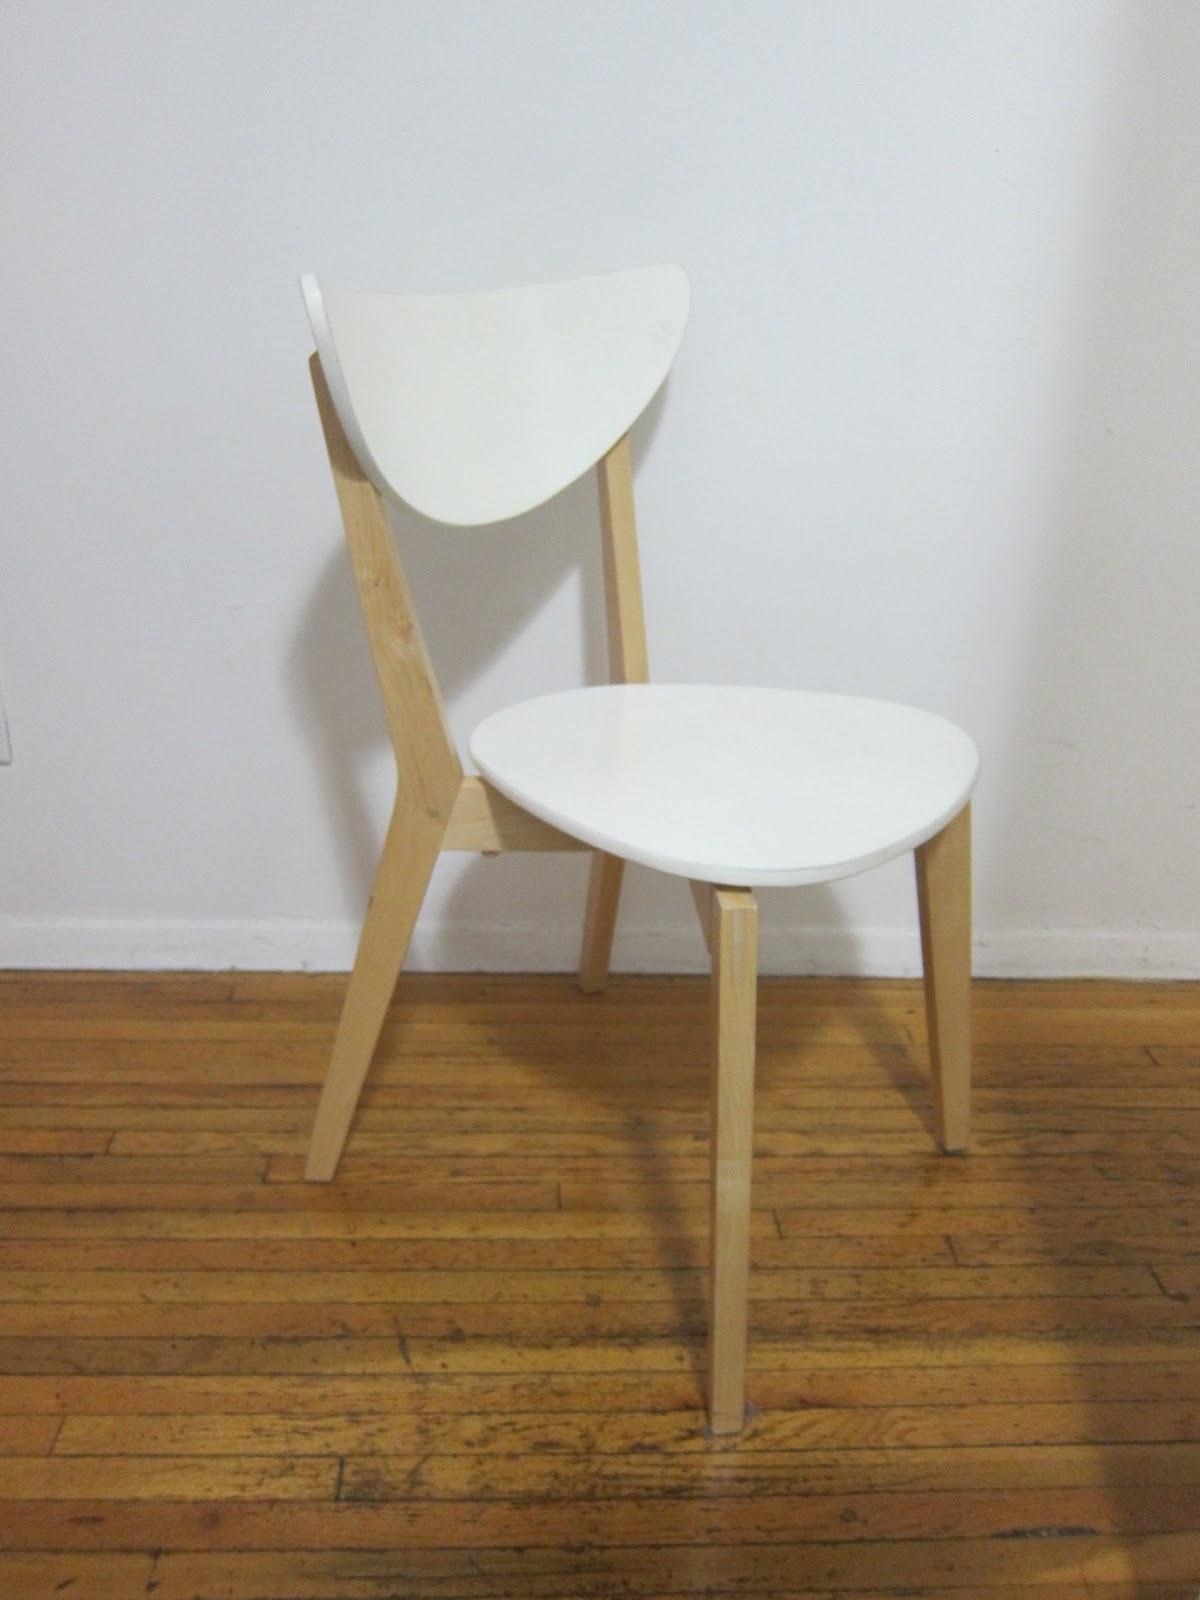 IKEA NORDMYRA Chair white birch 20 My Apartment Stuff : IMG4964 from myapartmentstuff.blogspot.com size 1200 x 1600 jpeg 137kB